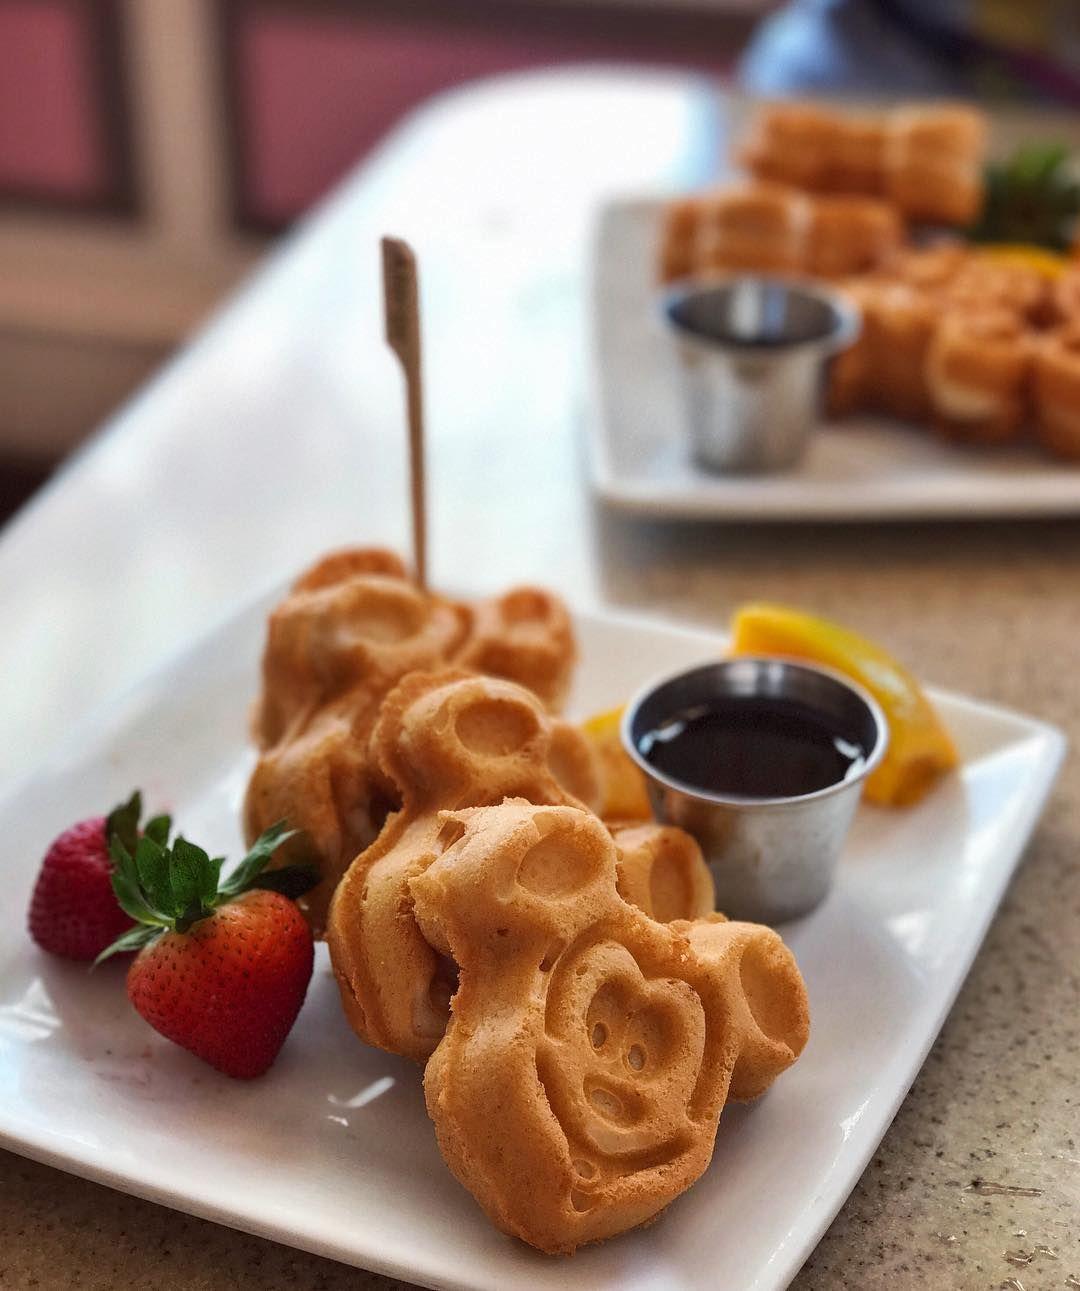 M I C K E Whaaat Vegan Food At Disneyland Yep That S Right And Plenty Of It Too Food Disneyland Food Vegan Waffles